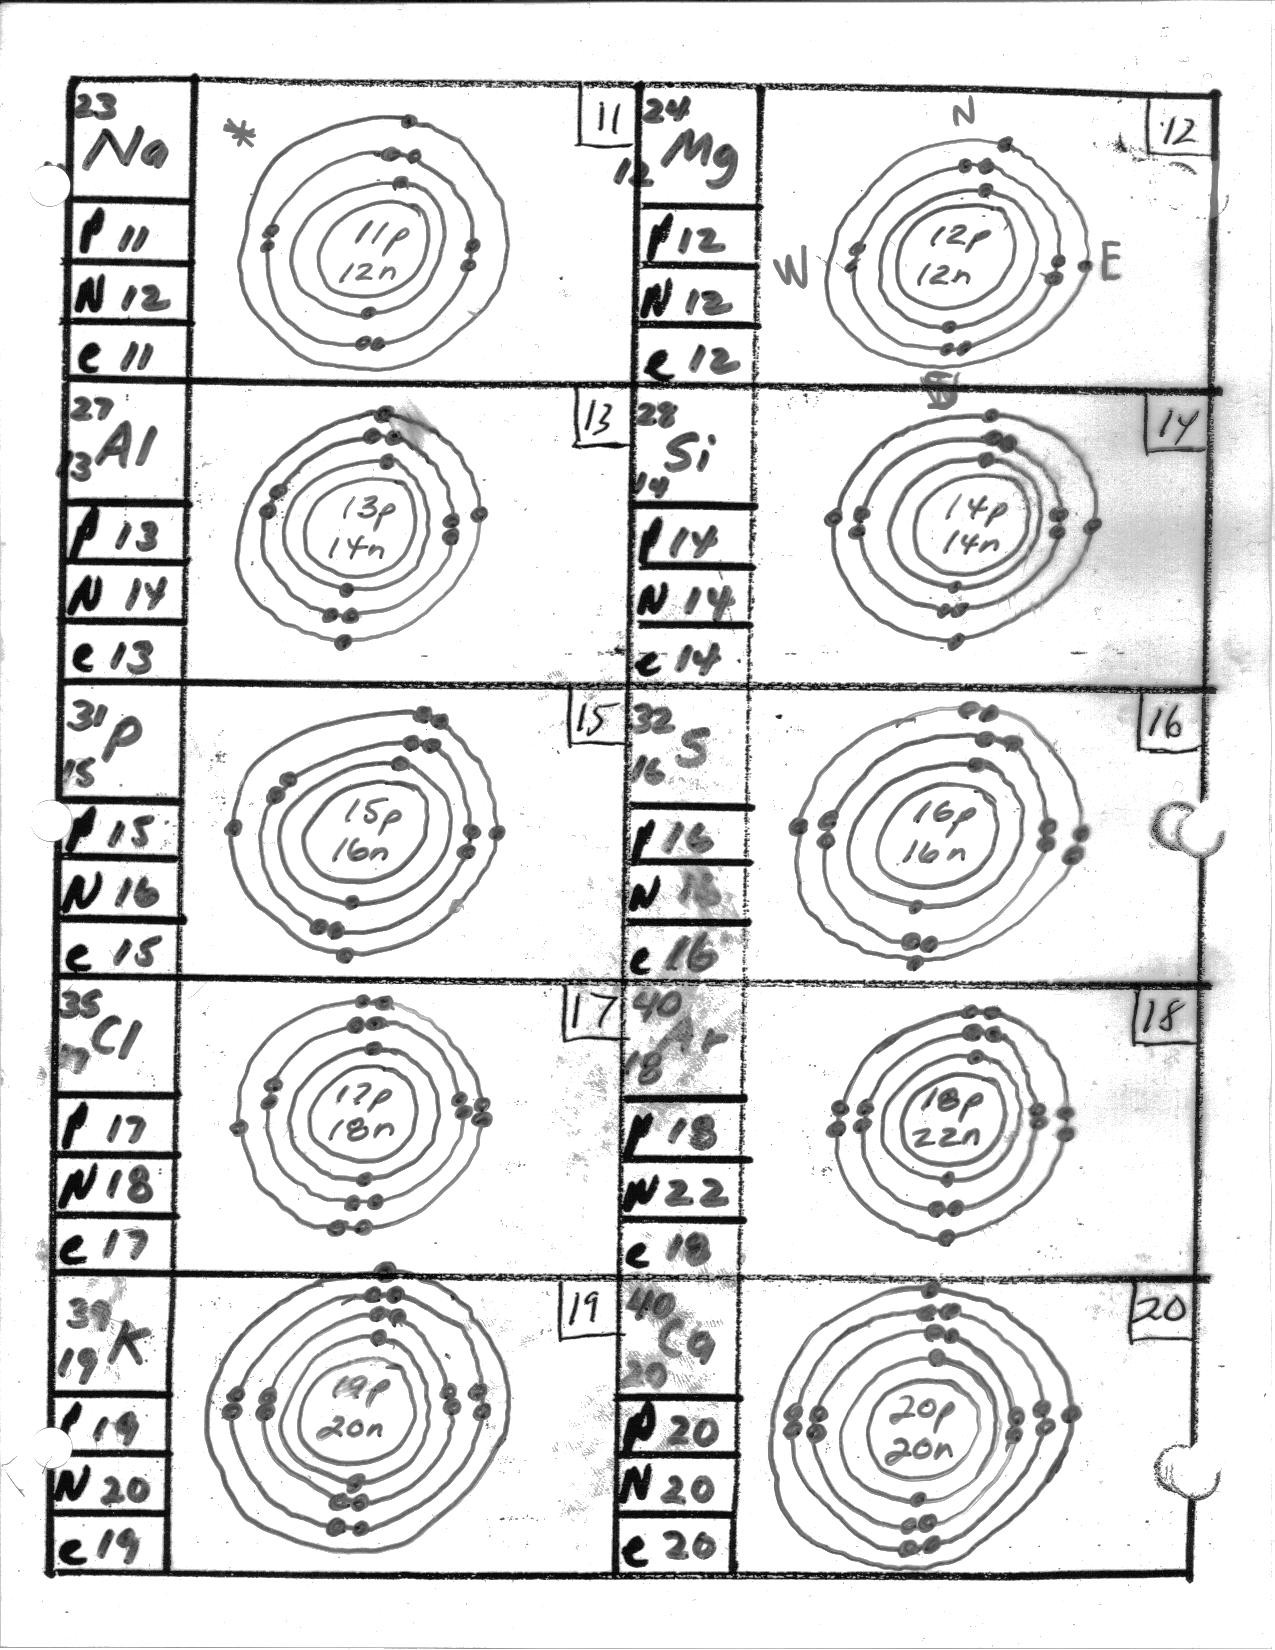 Drawing atoms Worksheet Answer Key atomic Structure Bohr Model Worksheet